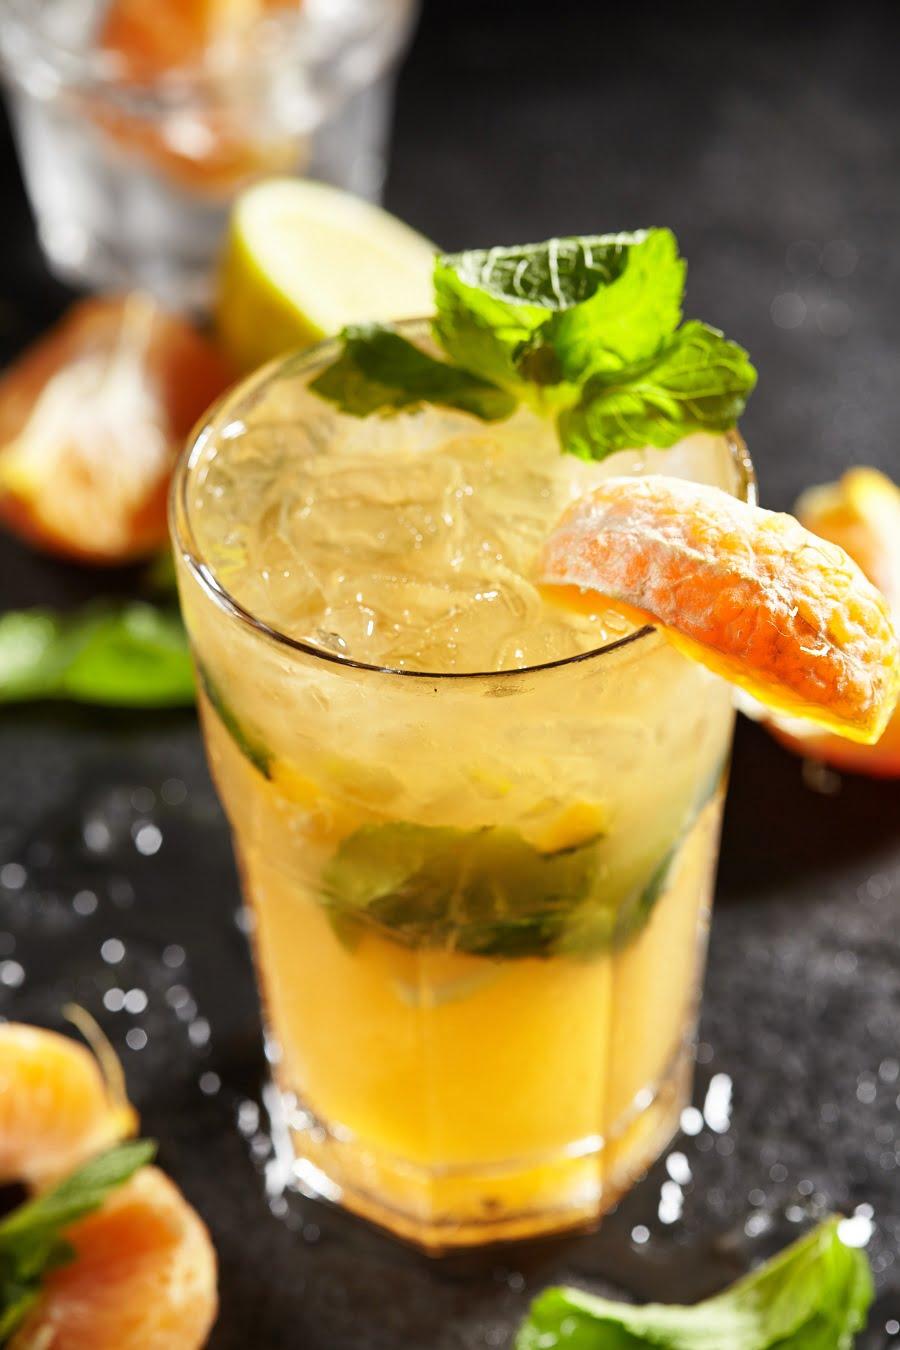 How to make a satsuma orange mojito #recipe